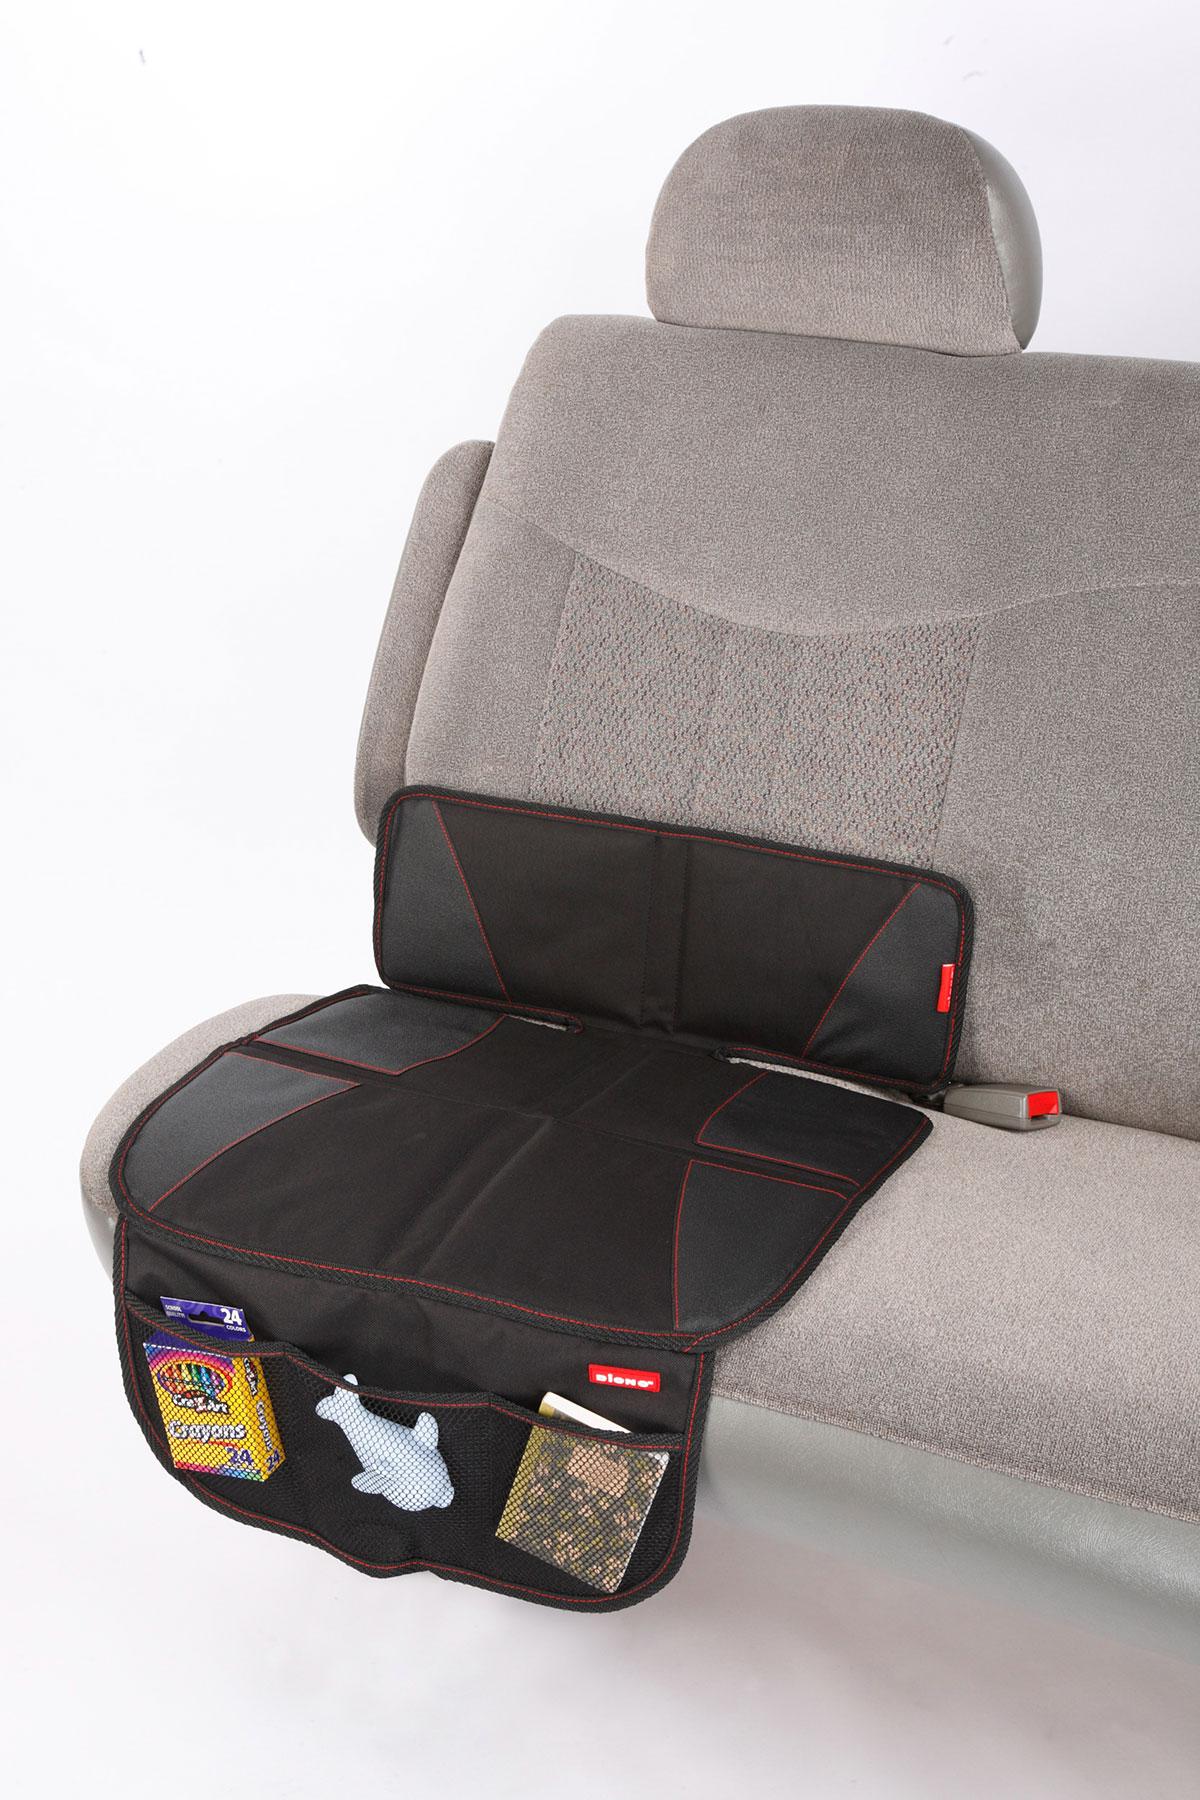 Sunshine Kids Diono Car Seat Travel Bag